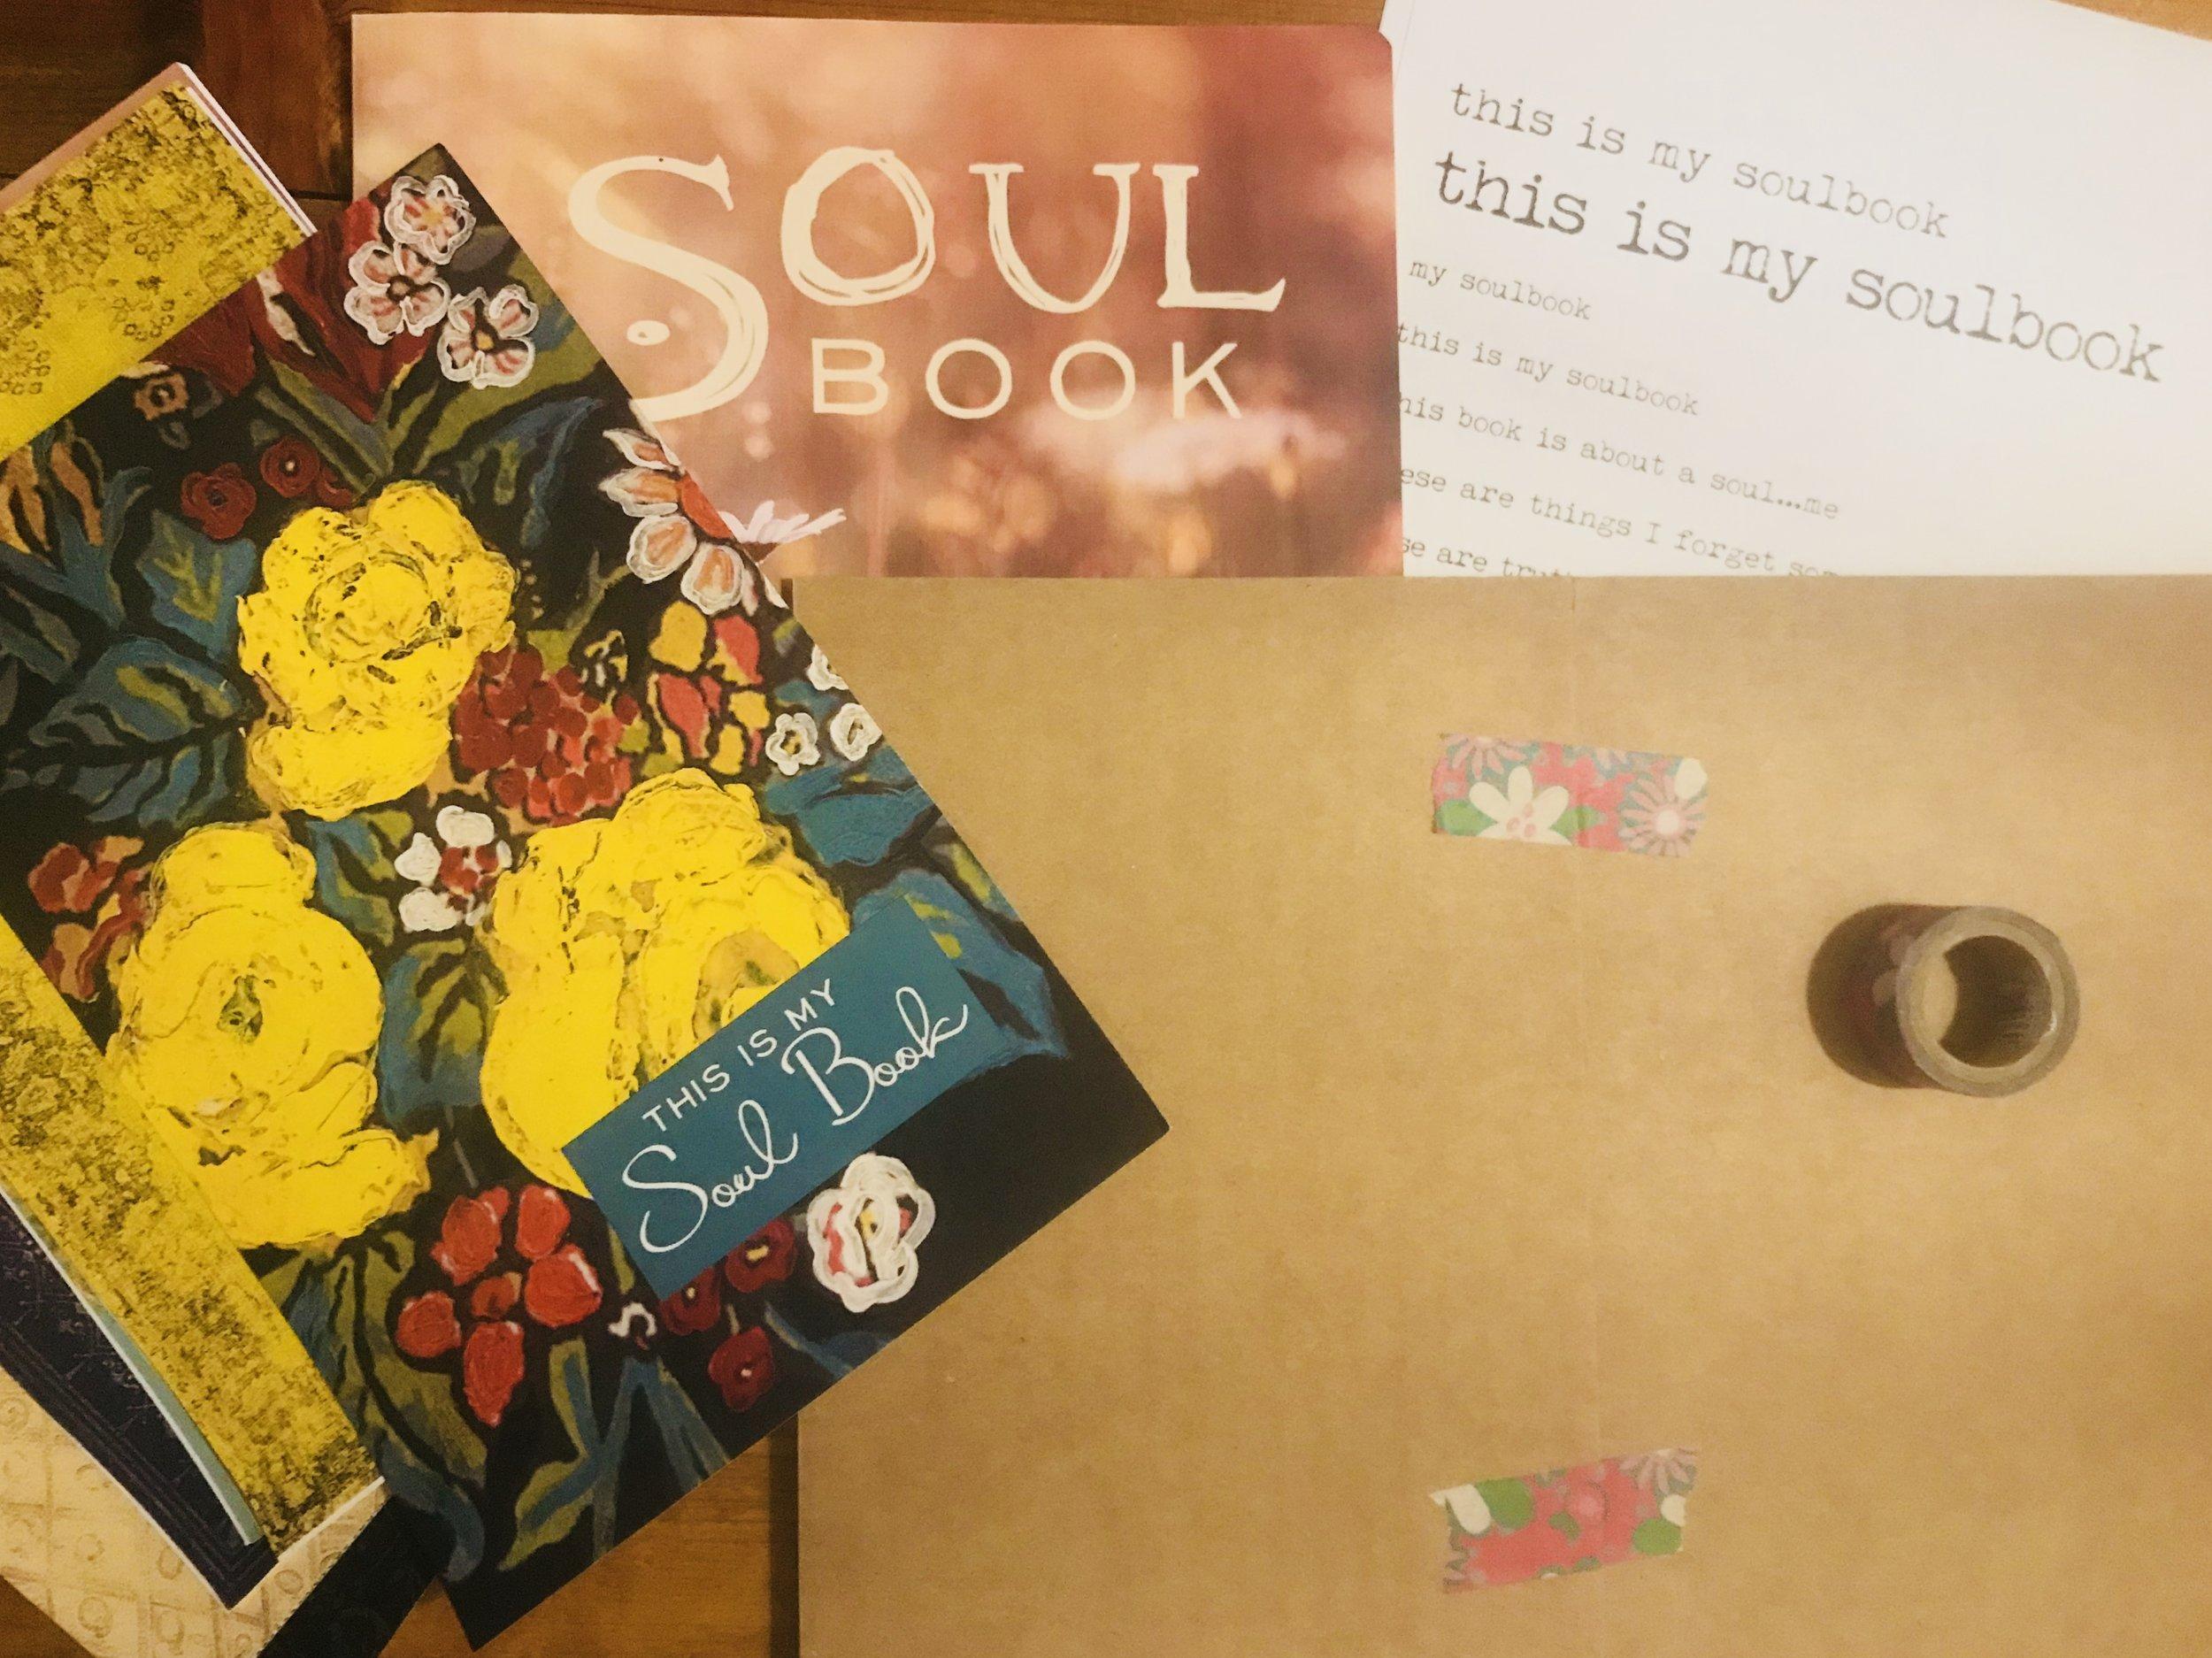 soulbook.jpg